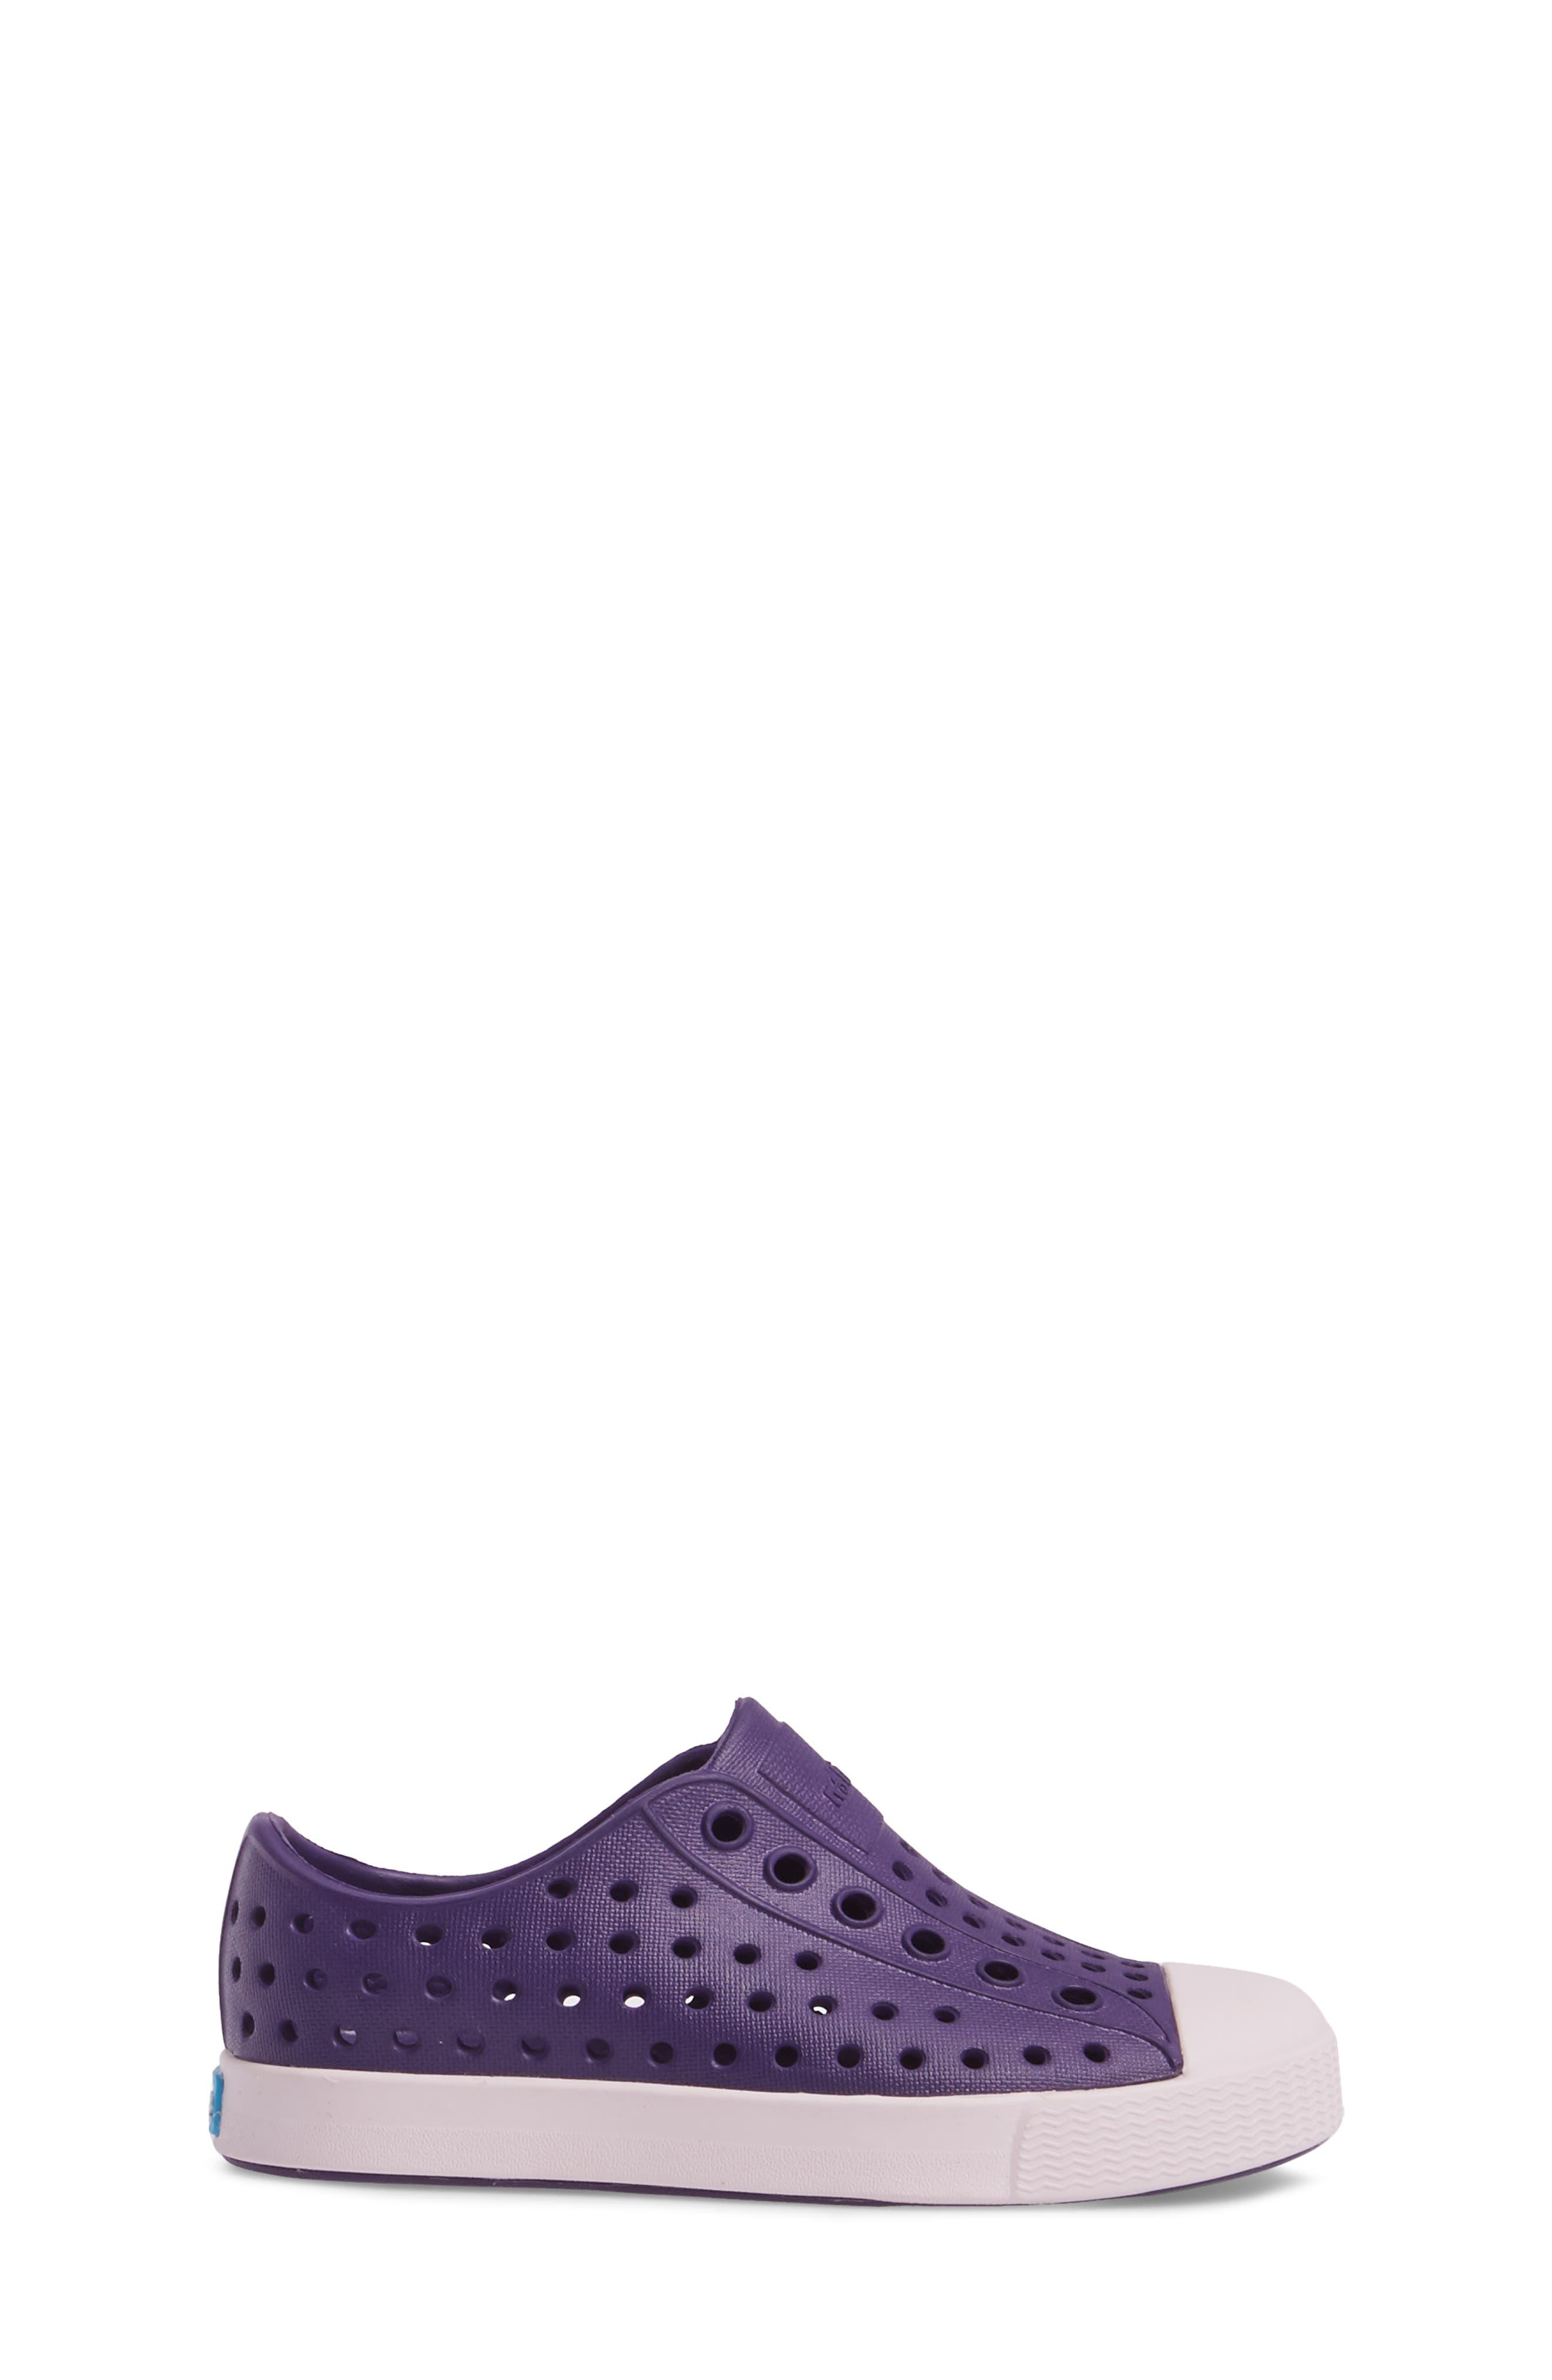 'Jefferson' Water Friendly Slip-On Sneaker,                             Alternate thumbnail 158, color,